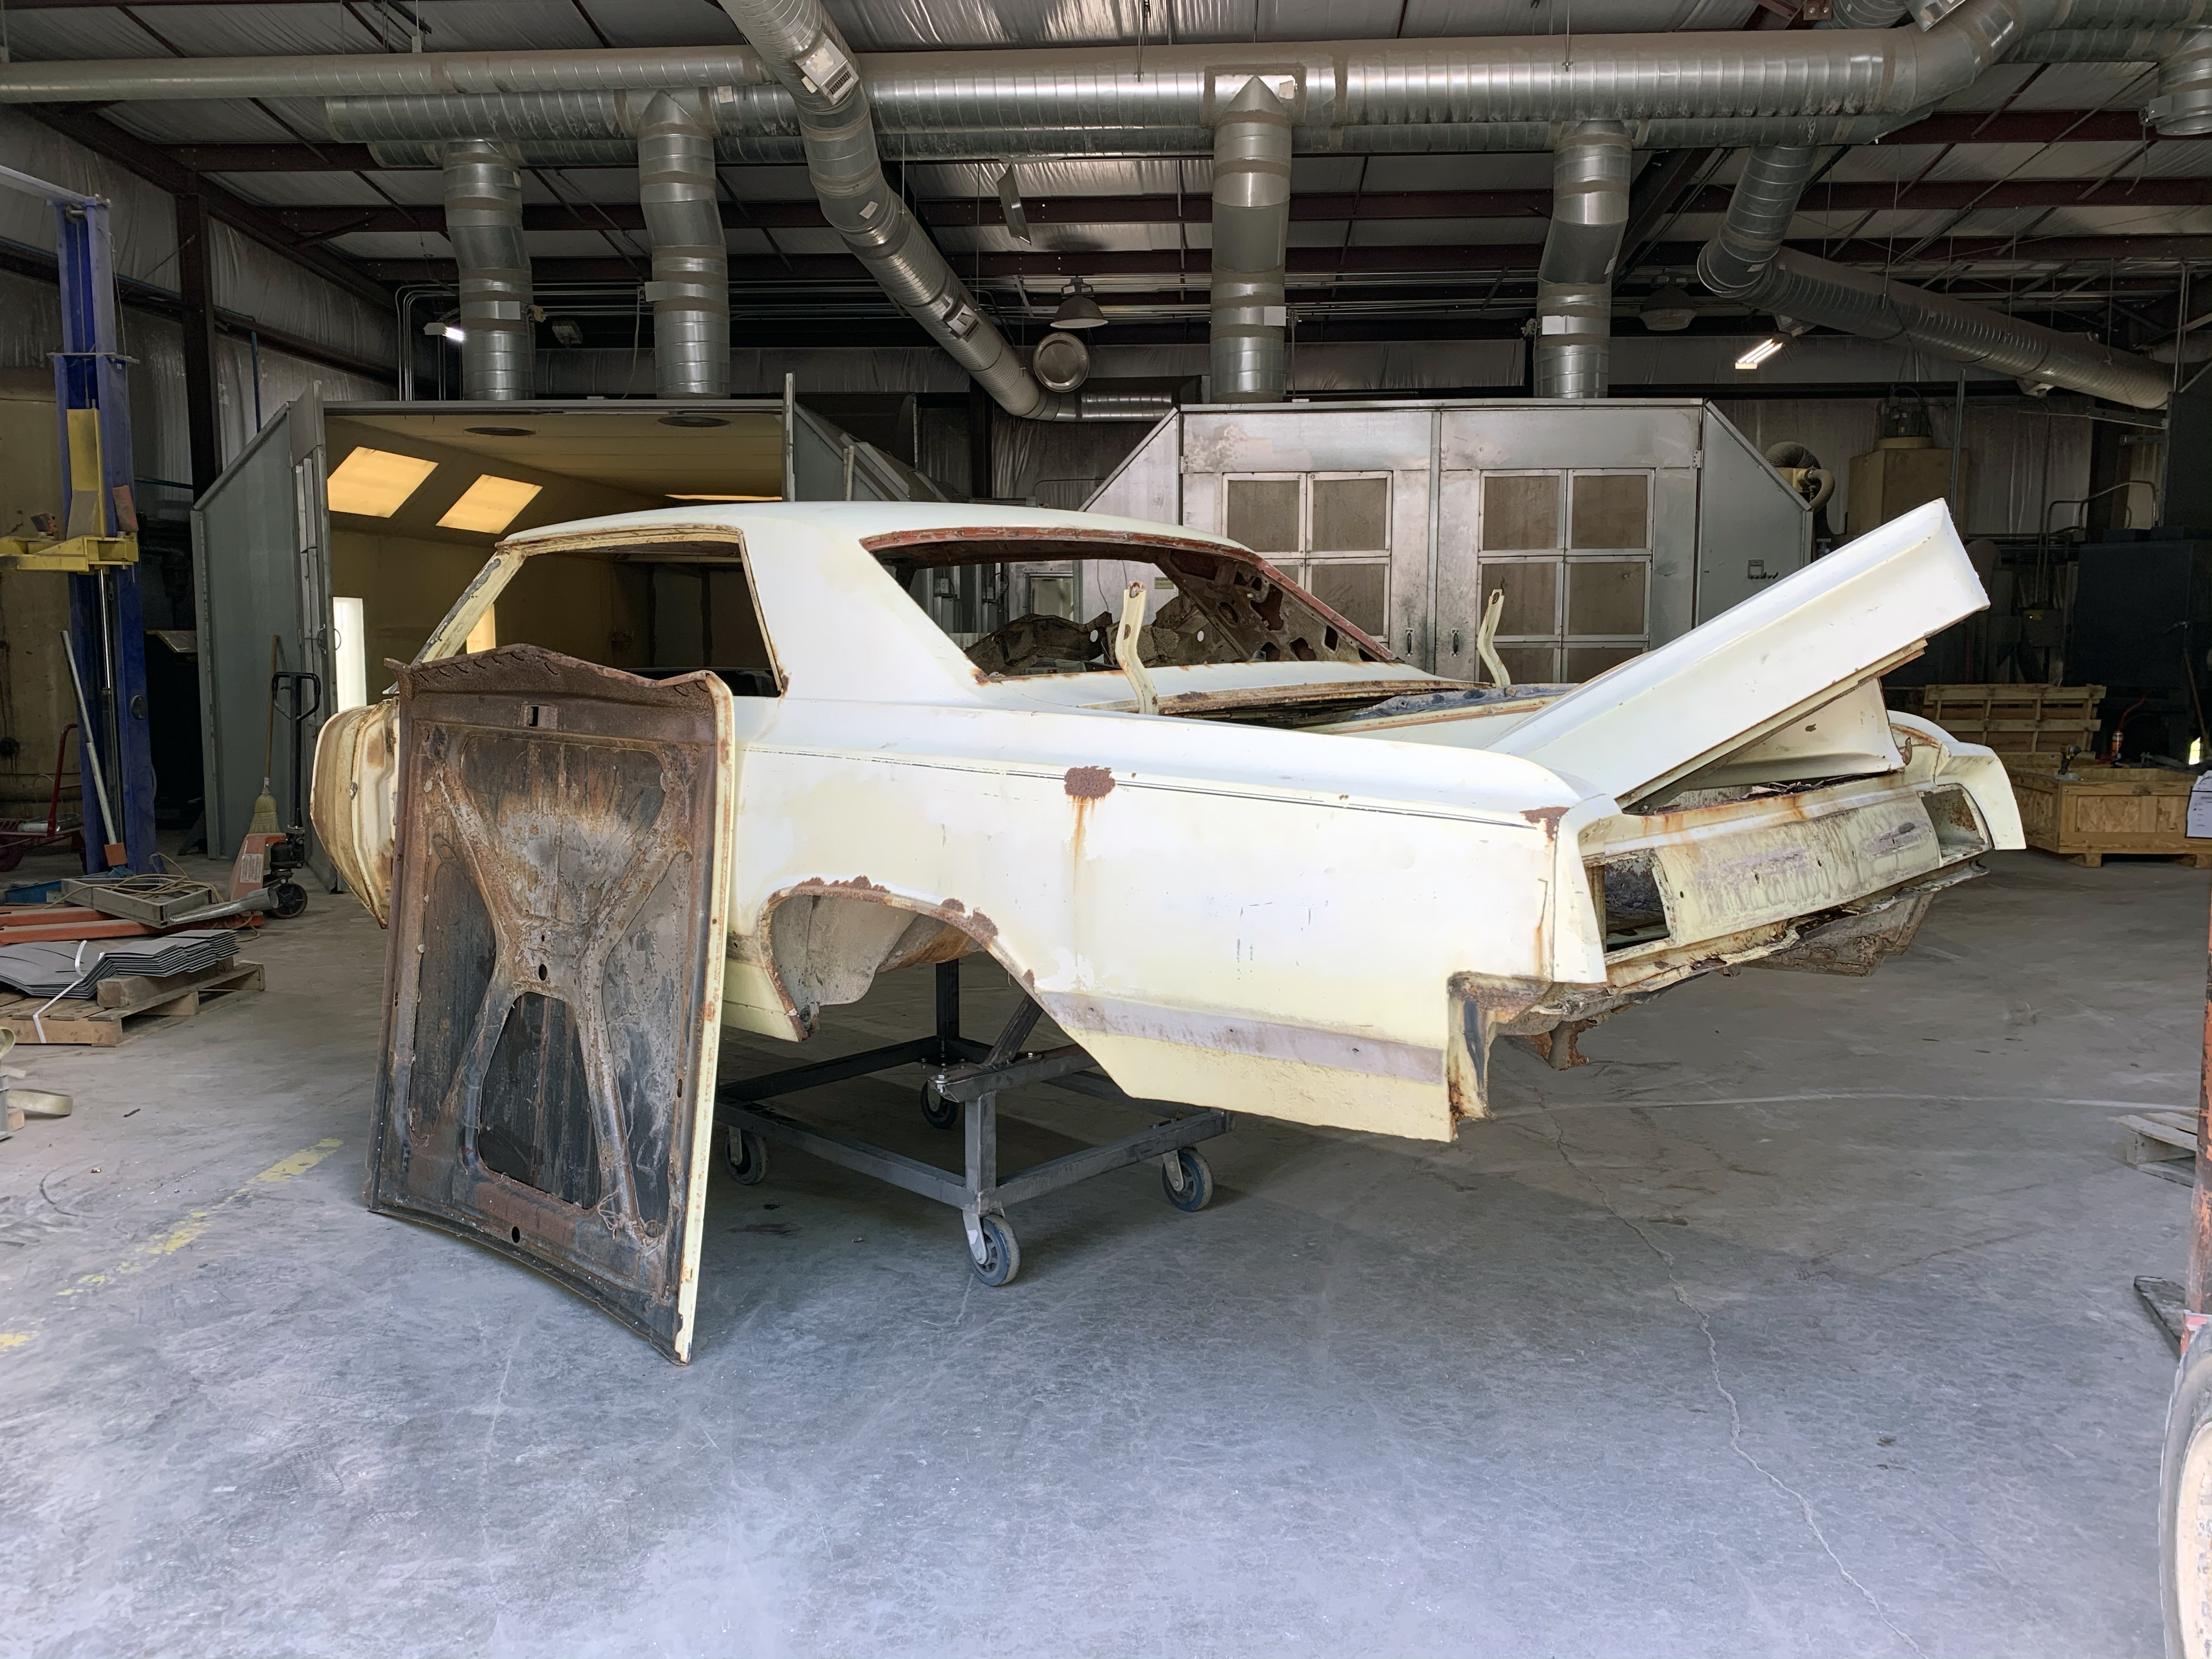 1_scotts-hotrods-65-cutlass-project-21